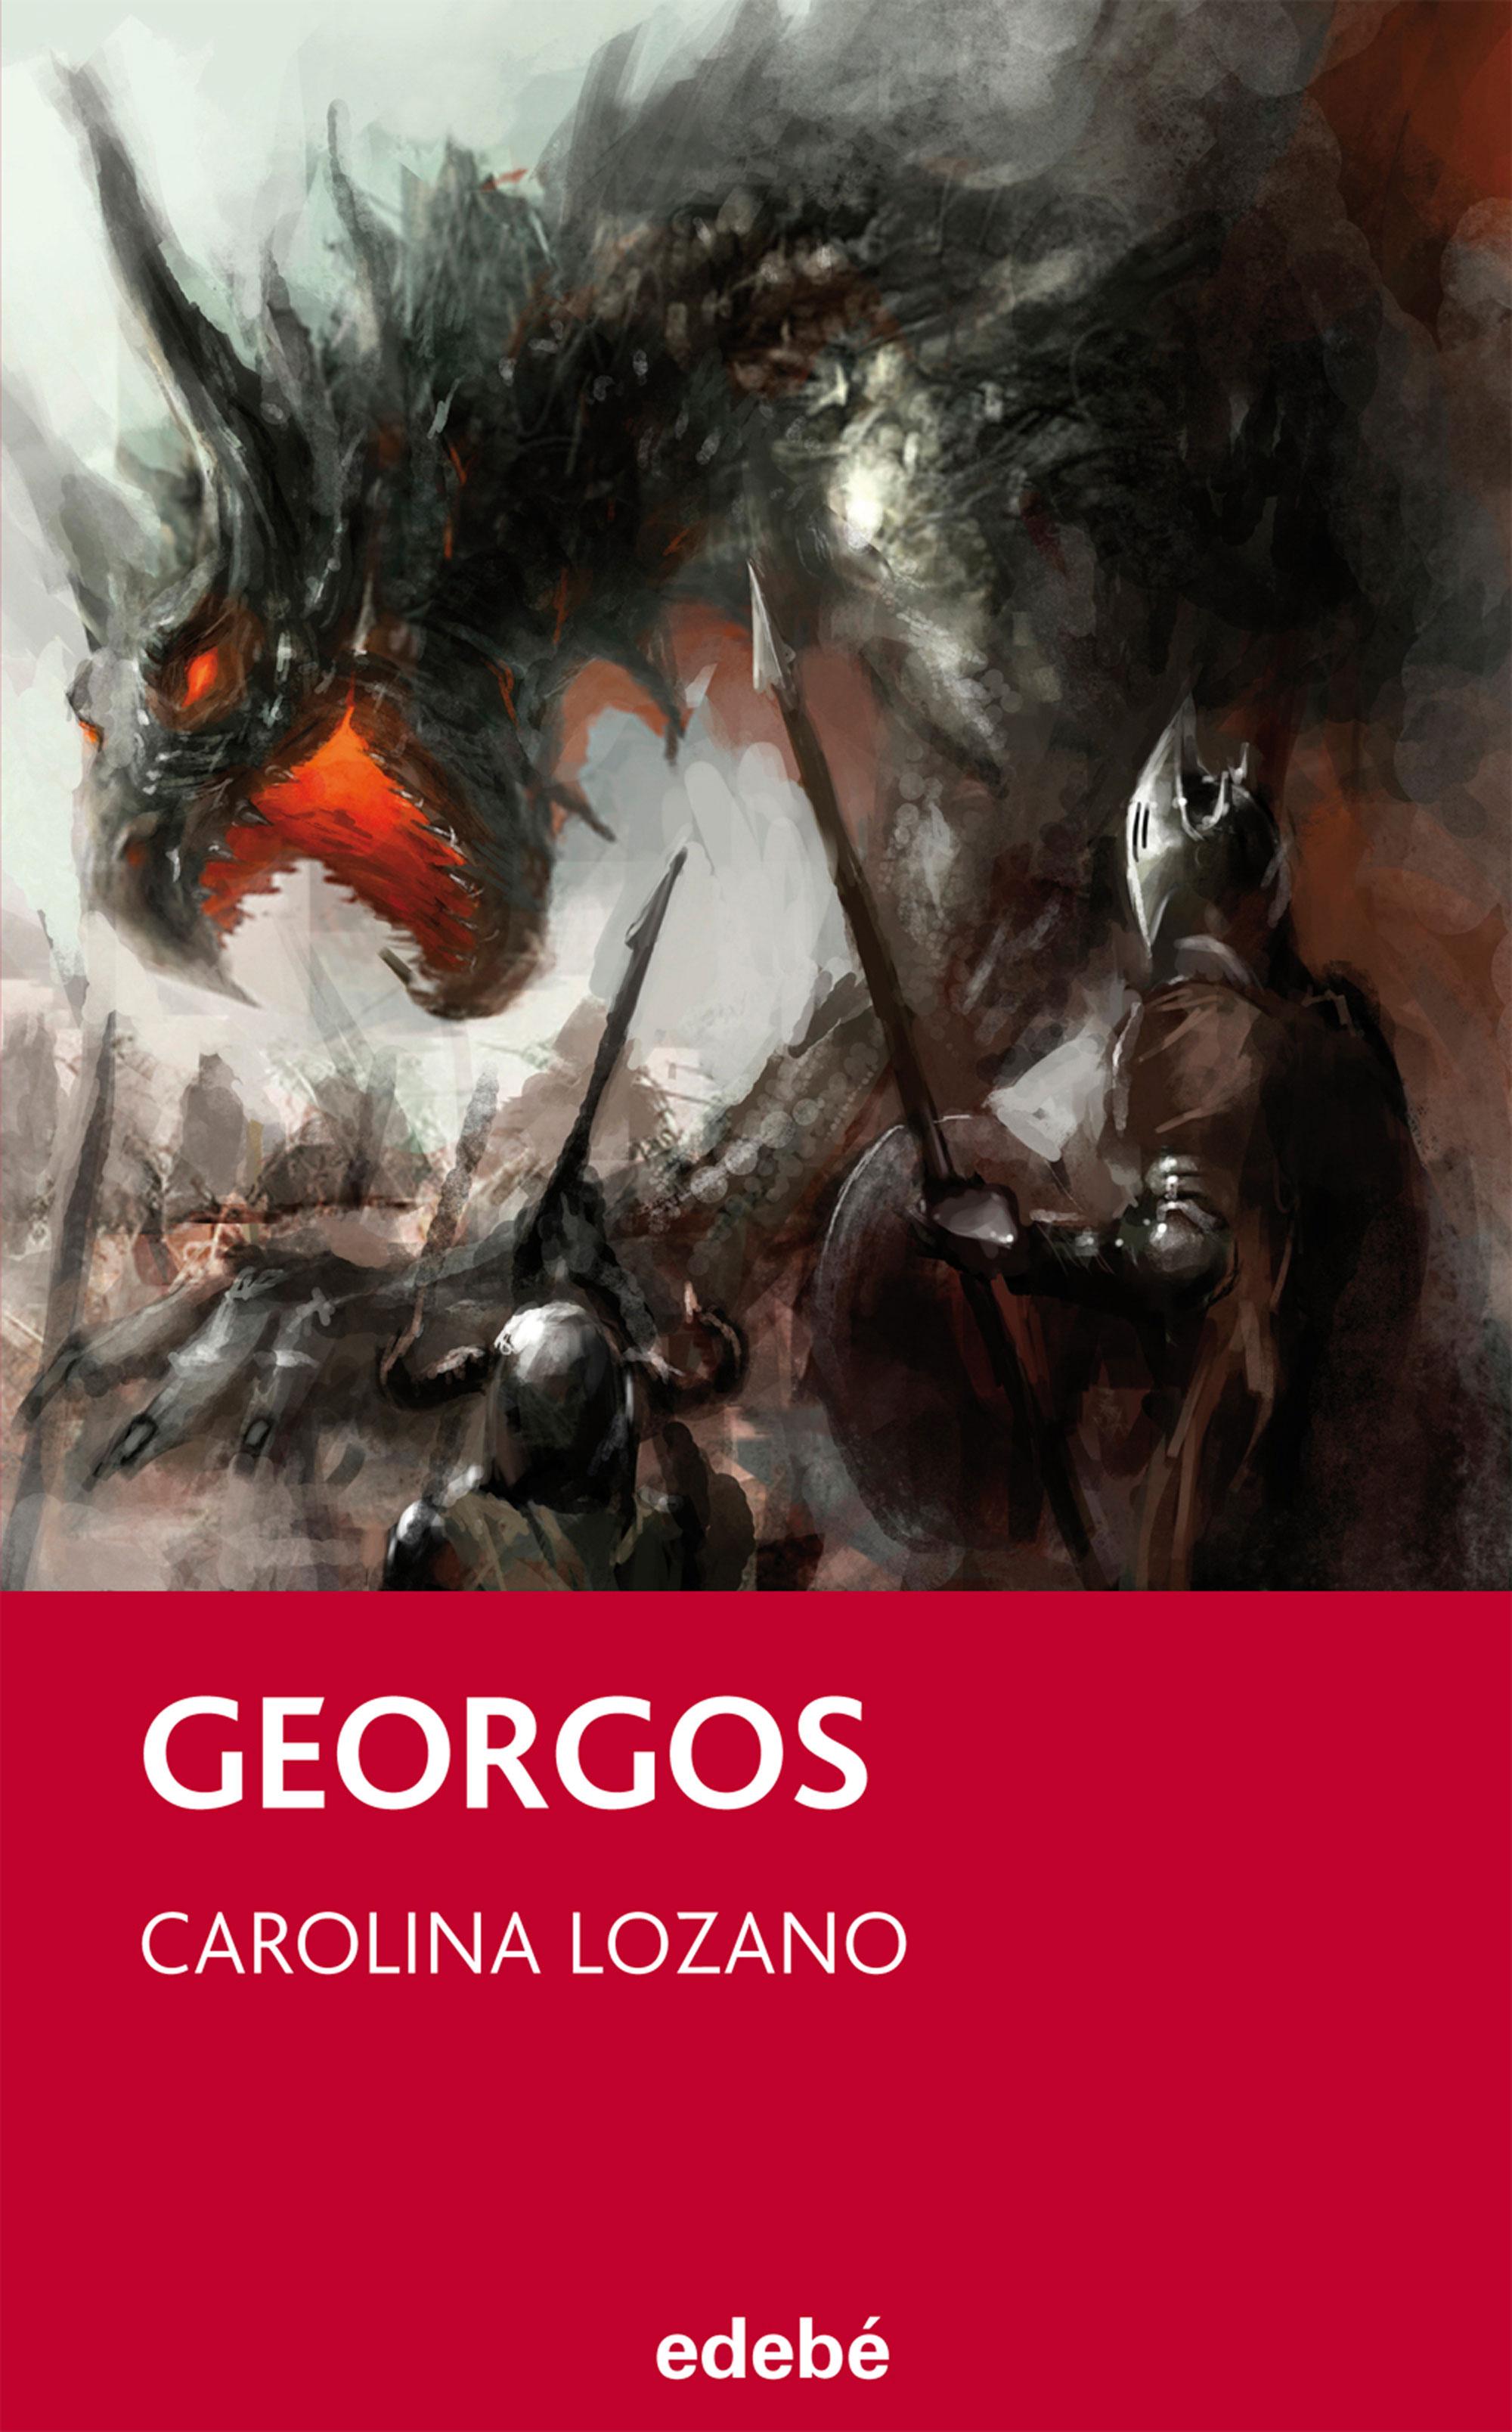 Georgos